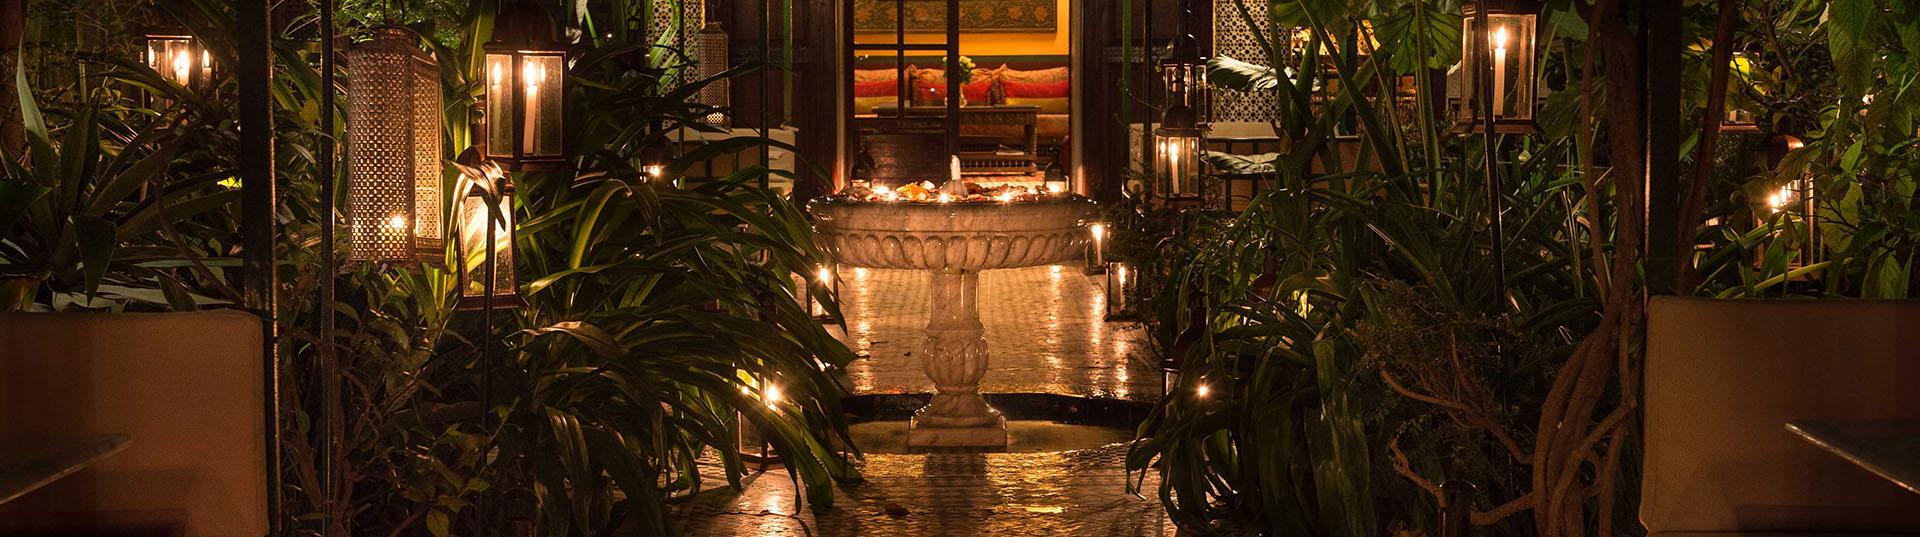 0001_patio-nuit-1